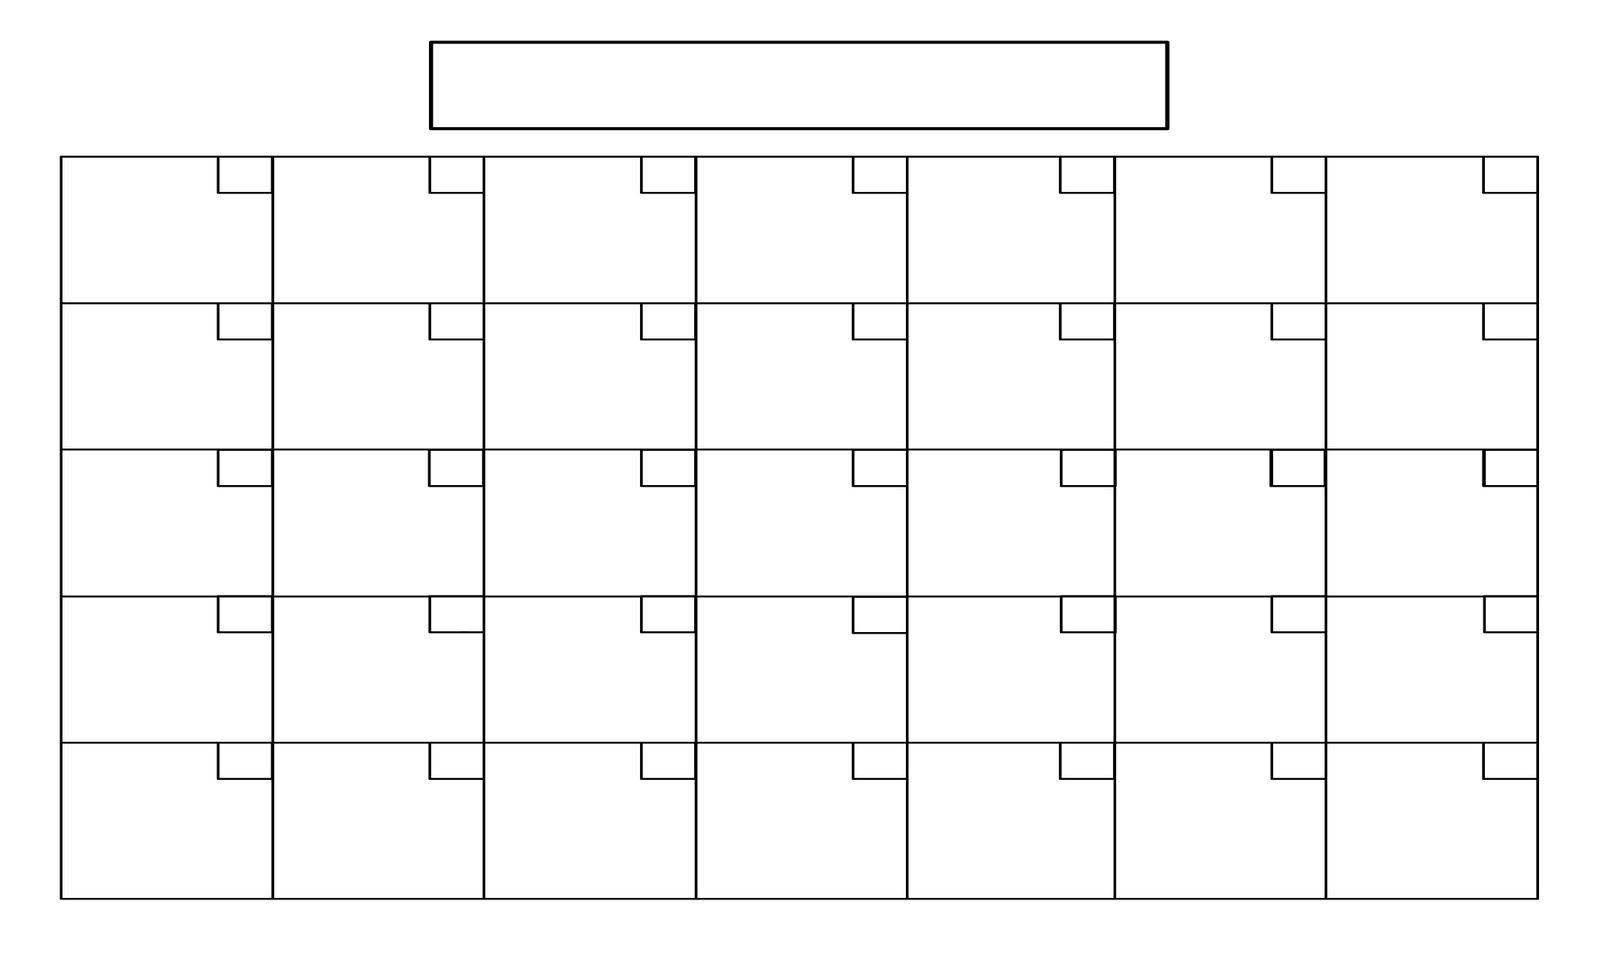 Printable+Full+Page+Blank+Calendar+Template | Boyscout | Free  1 Month Calendar Printable Blank